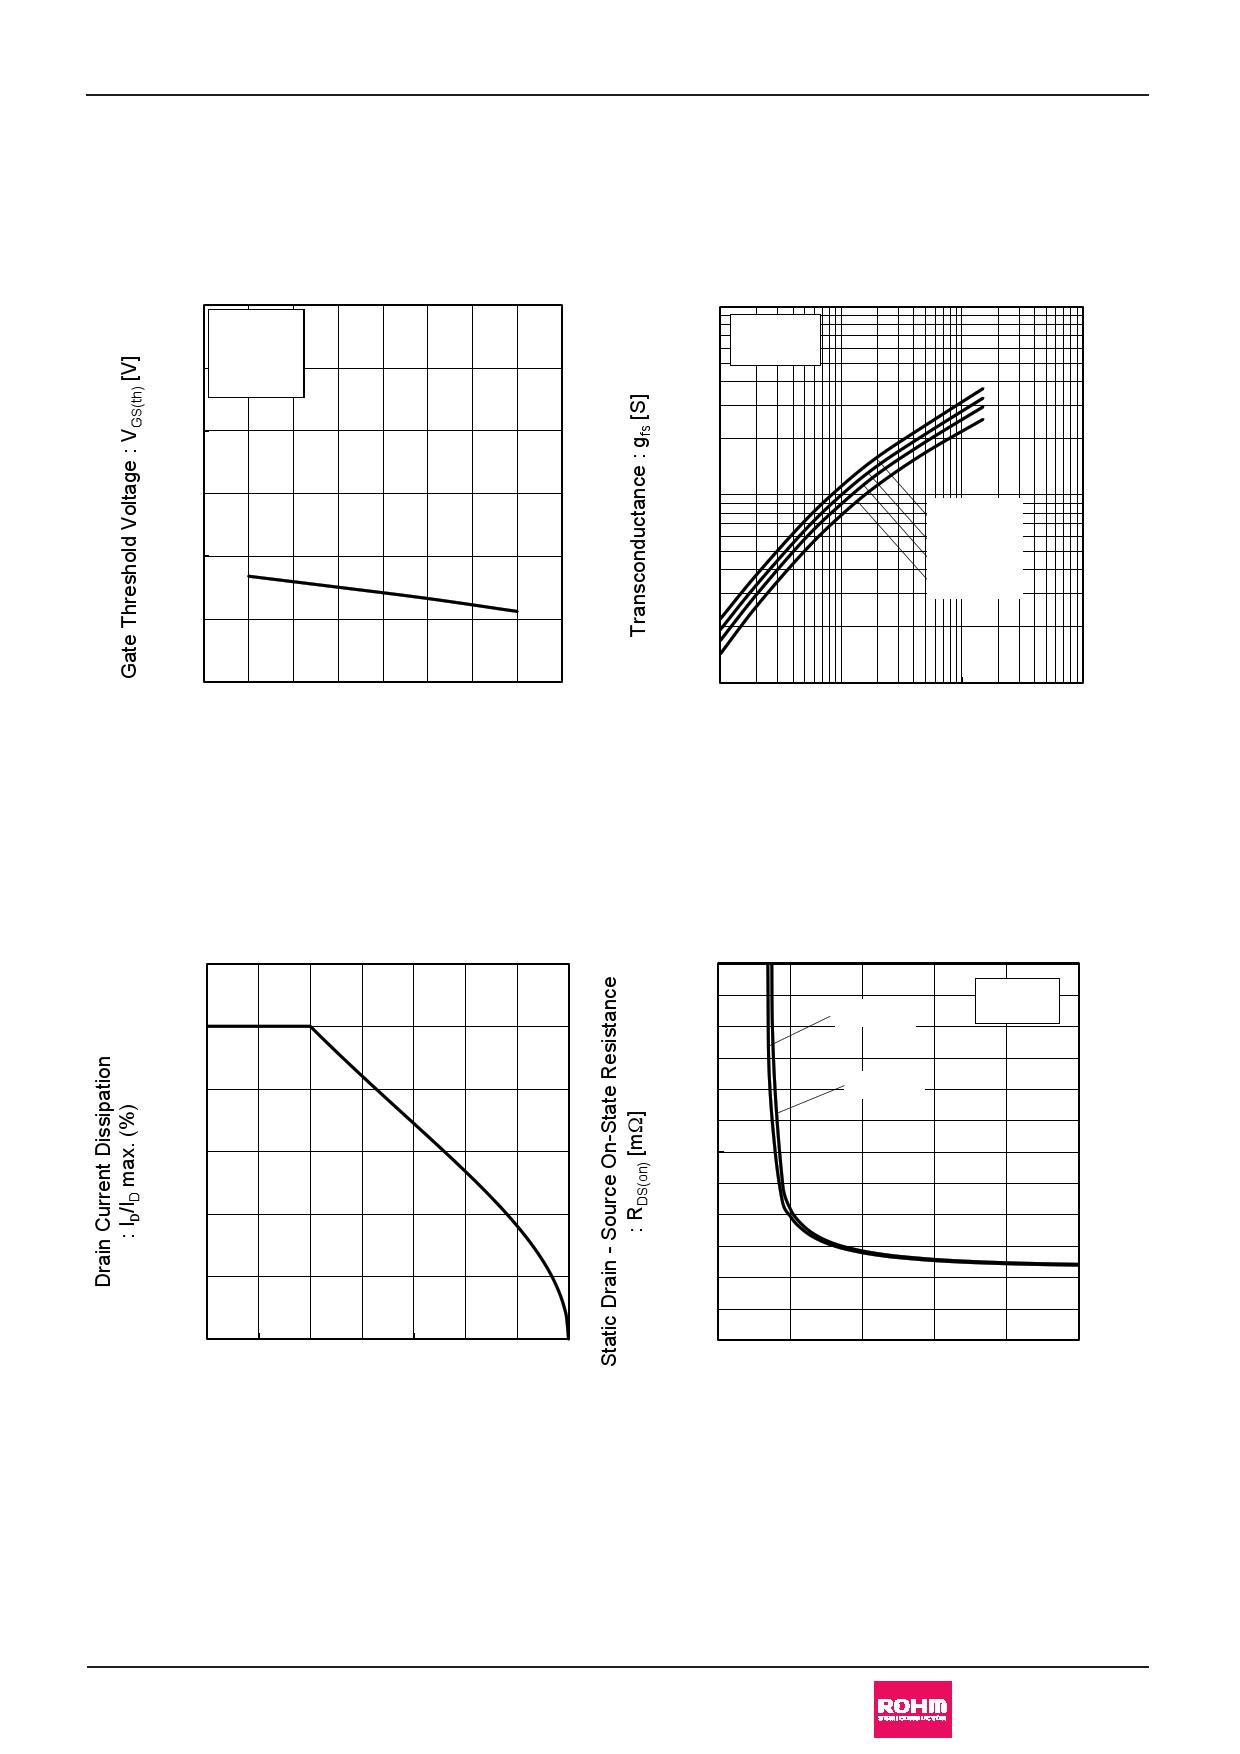 RW1C015UN Datasheet, Funktion